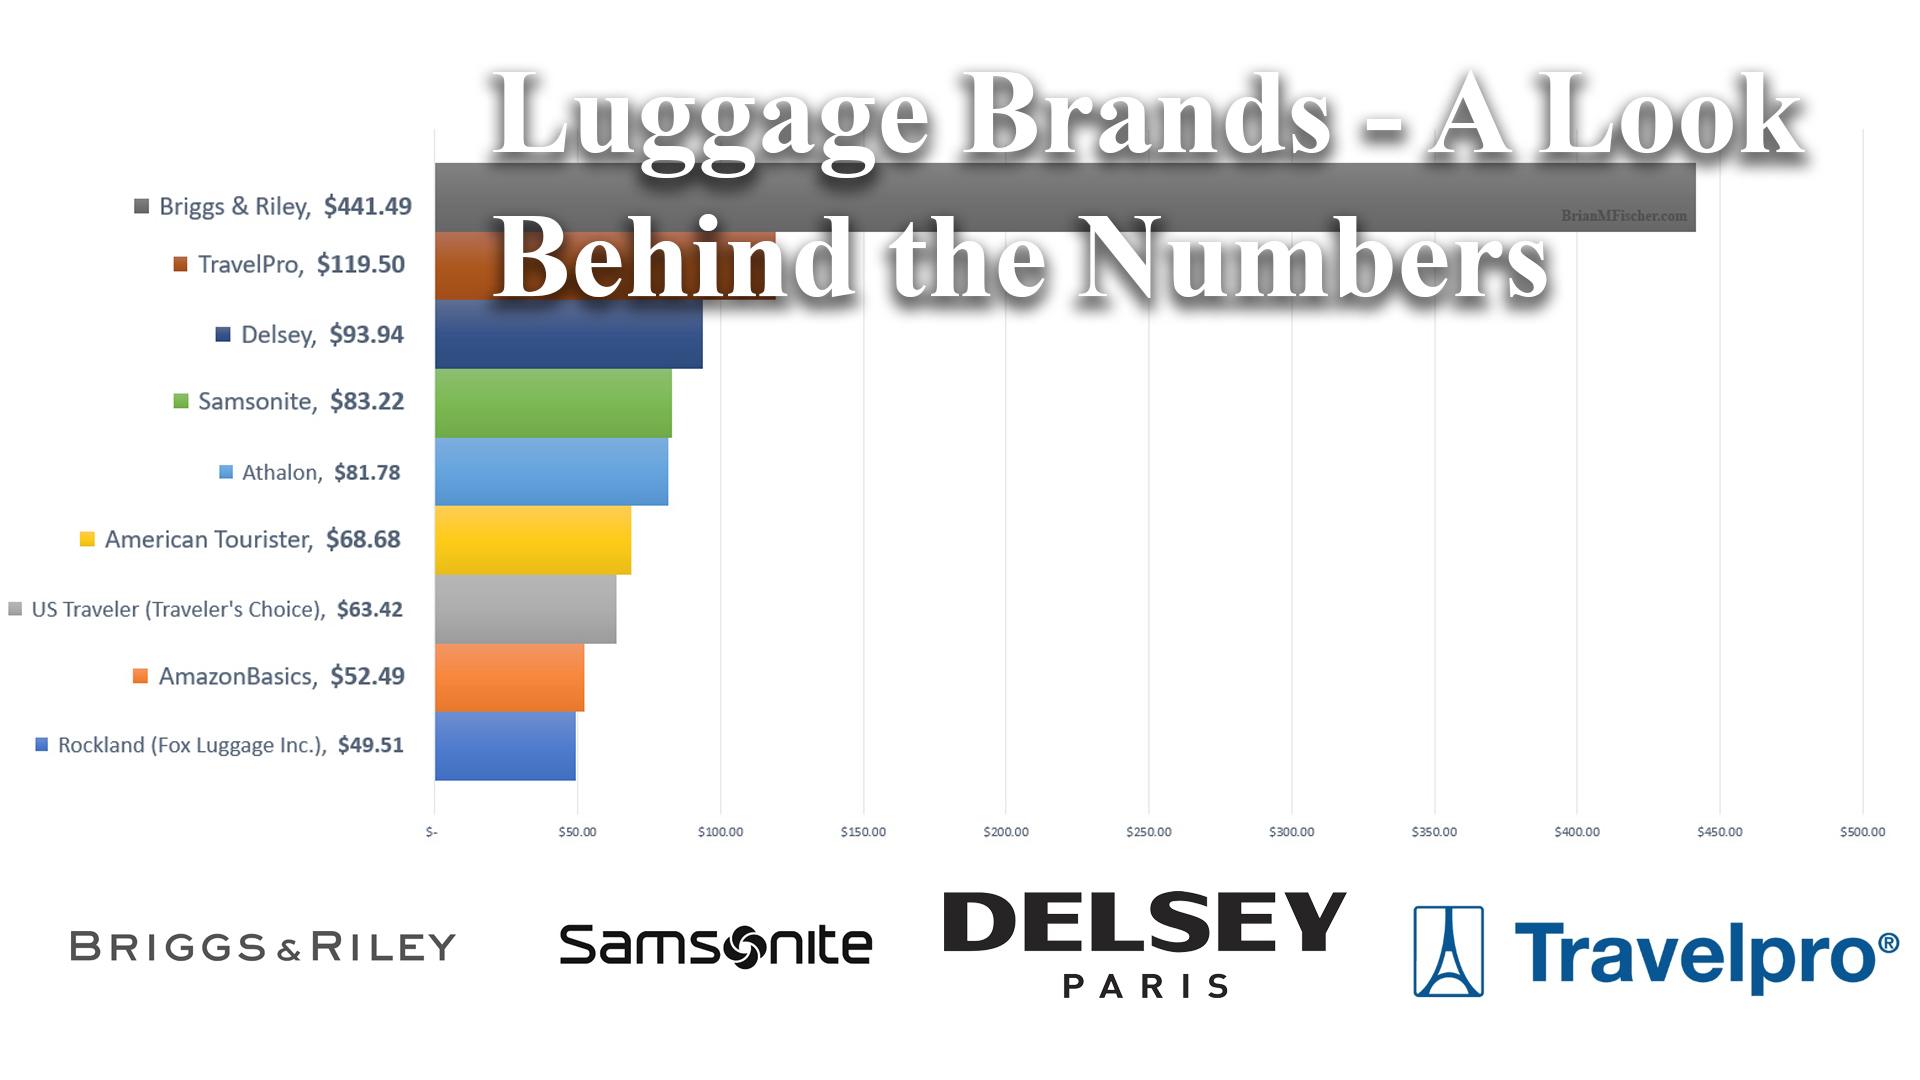 Luggage Brands Analysis